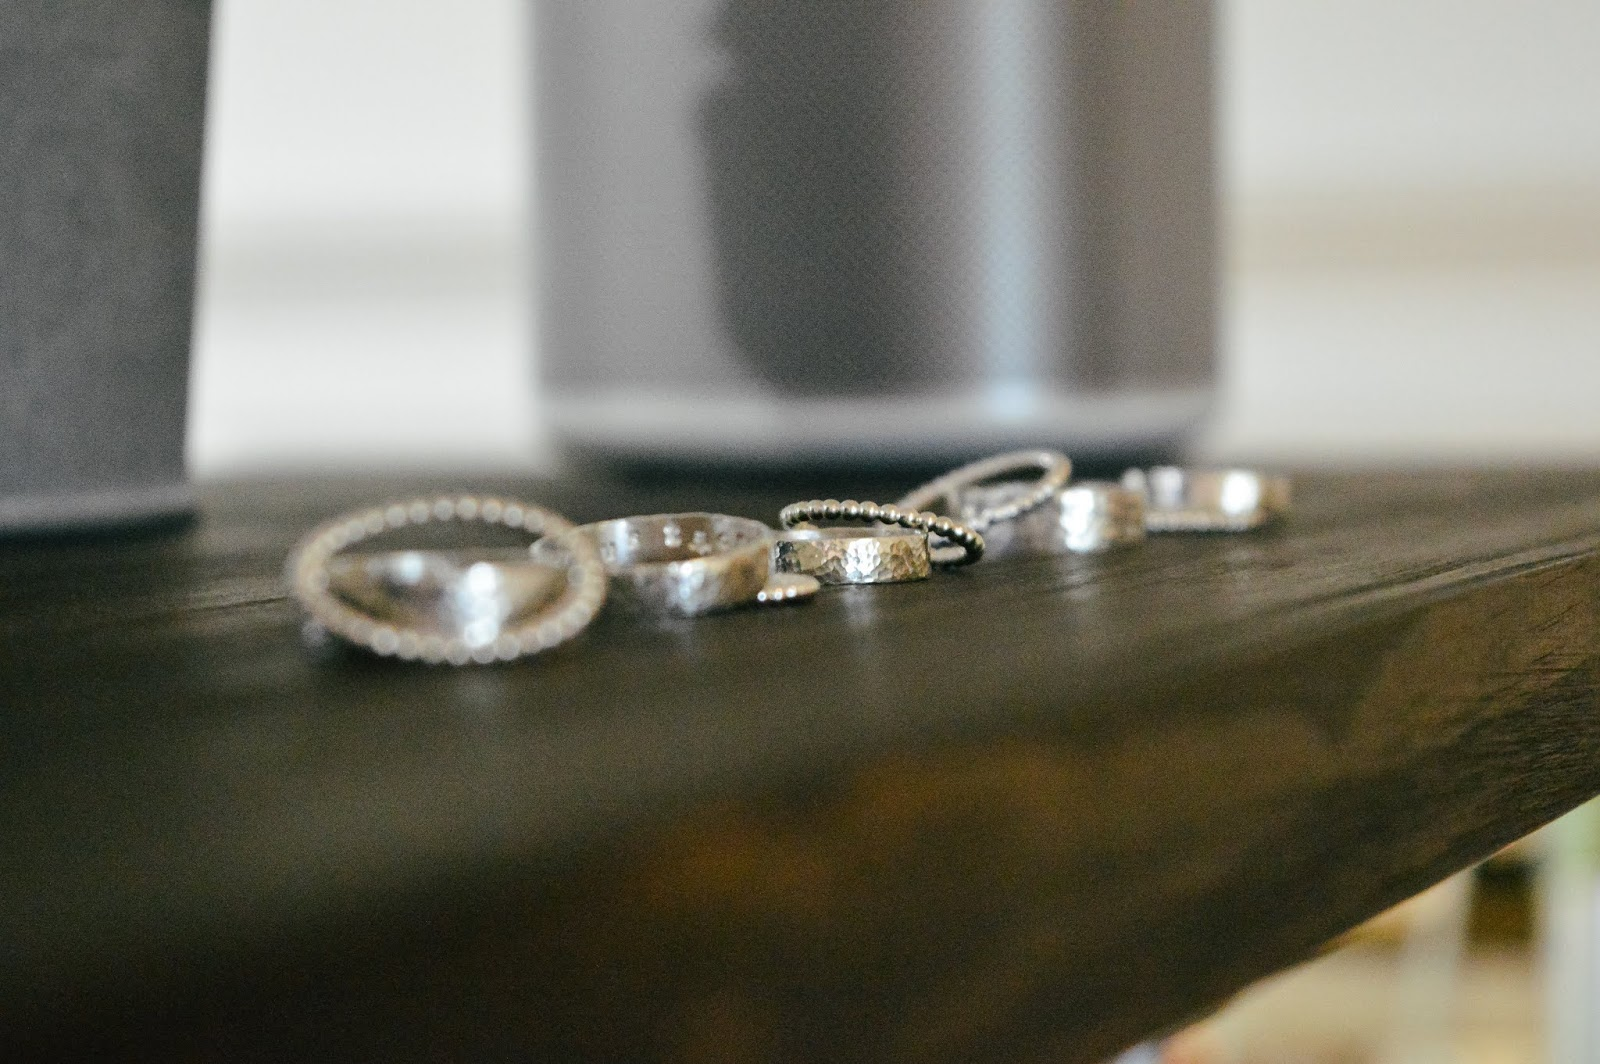 JewelleryMoves Hampshire workshops, jewellery workshops Hampshire, make your own jewellery Hampshire, Hampshire bloggers